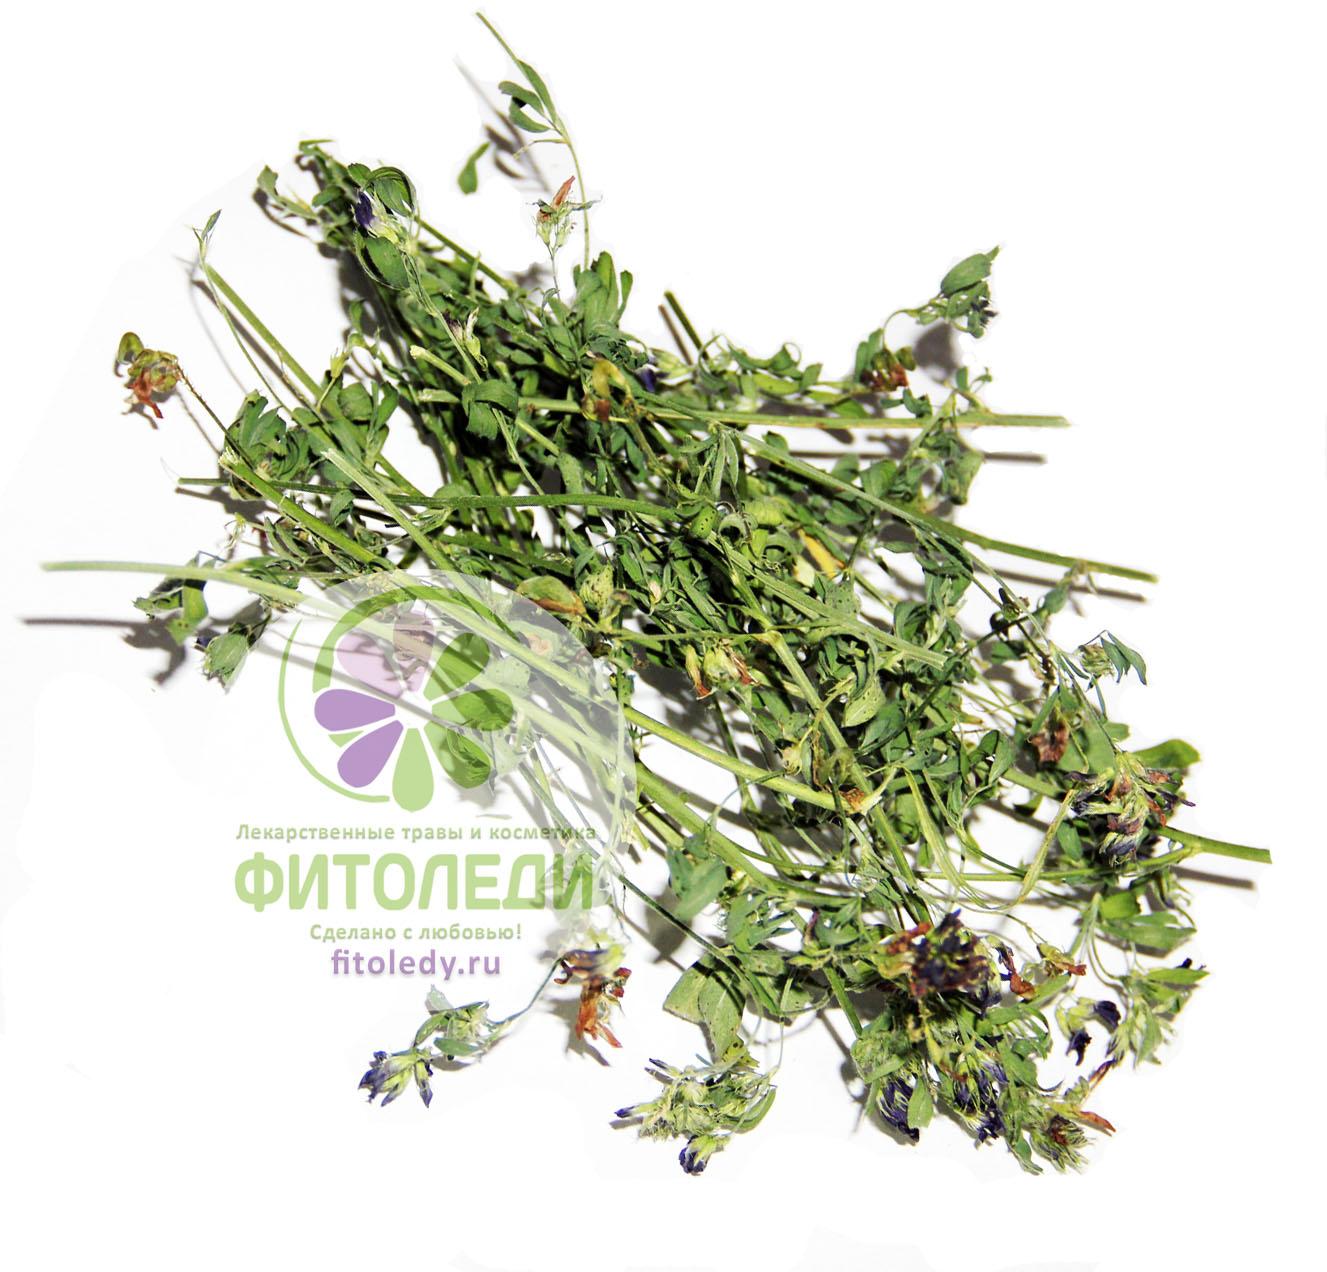 Купить траву люцерны